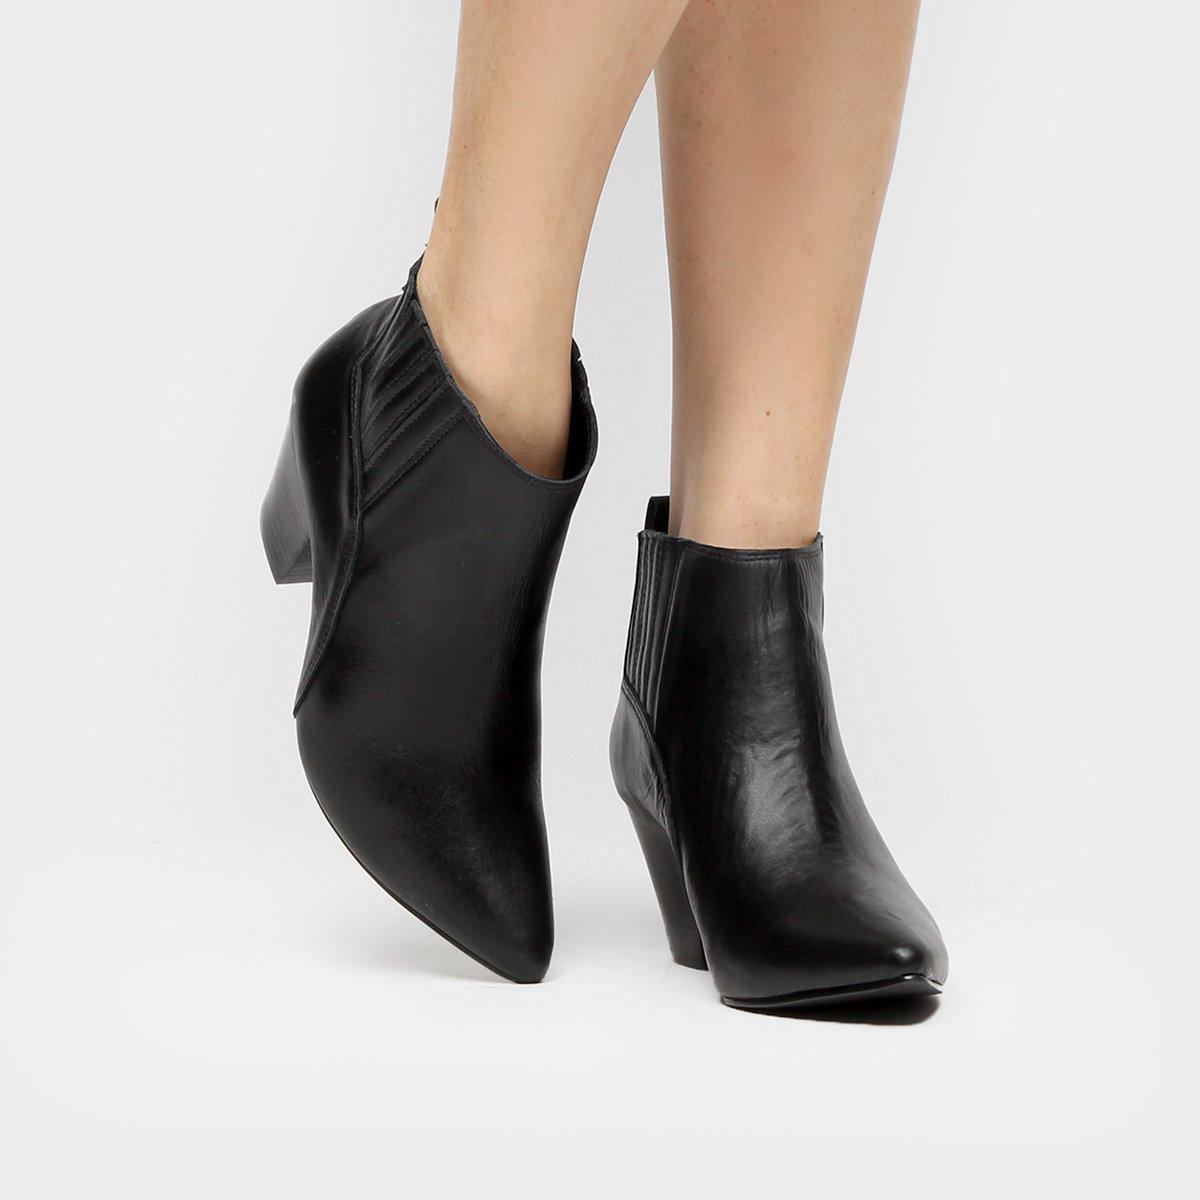 b7ebf6baf4 Bota Couro Chelsea Shoestock Salto Grosso Feminina | Shoestock